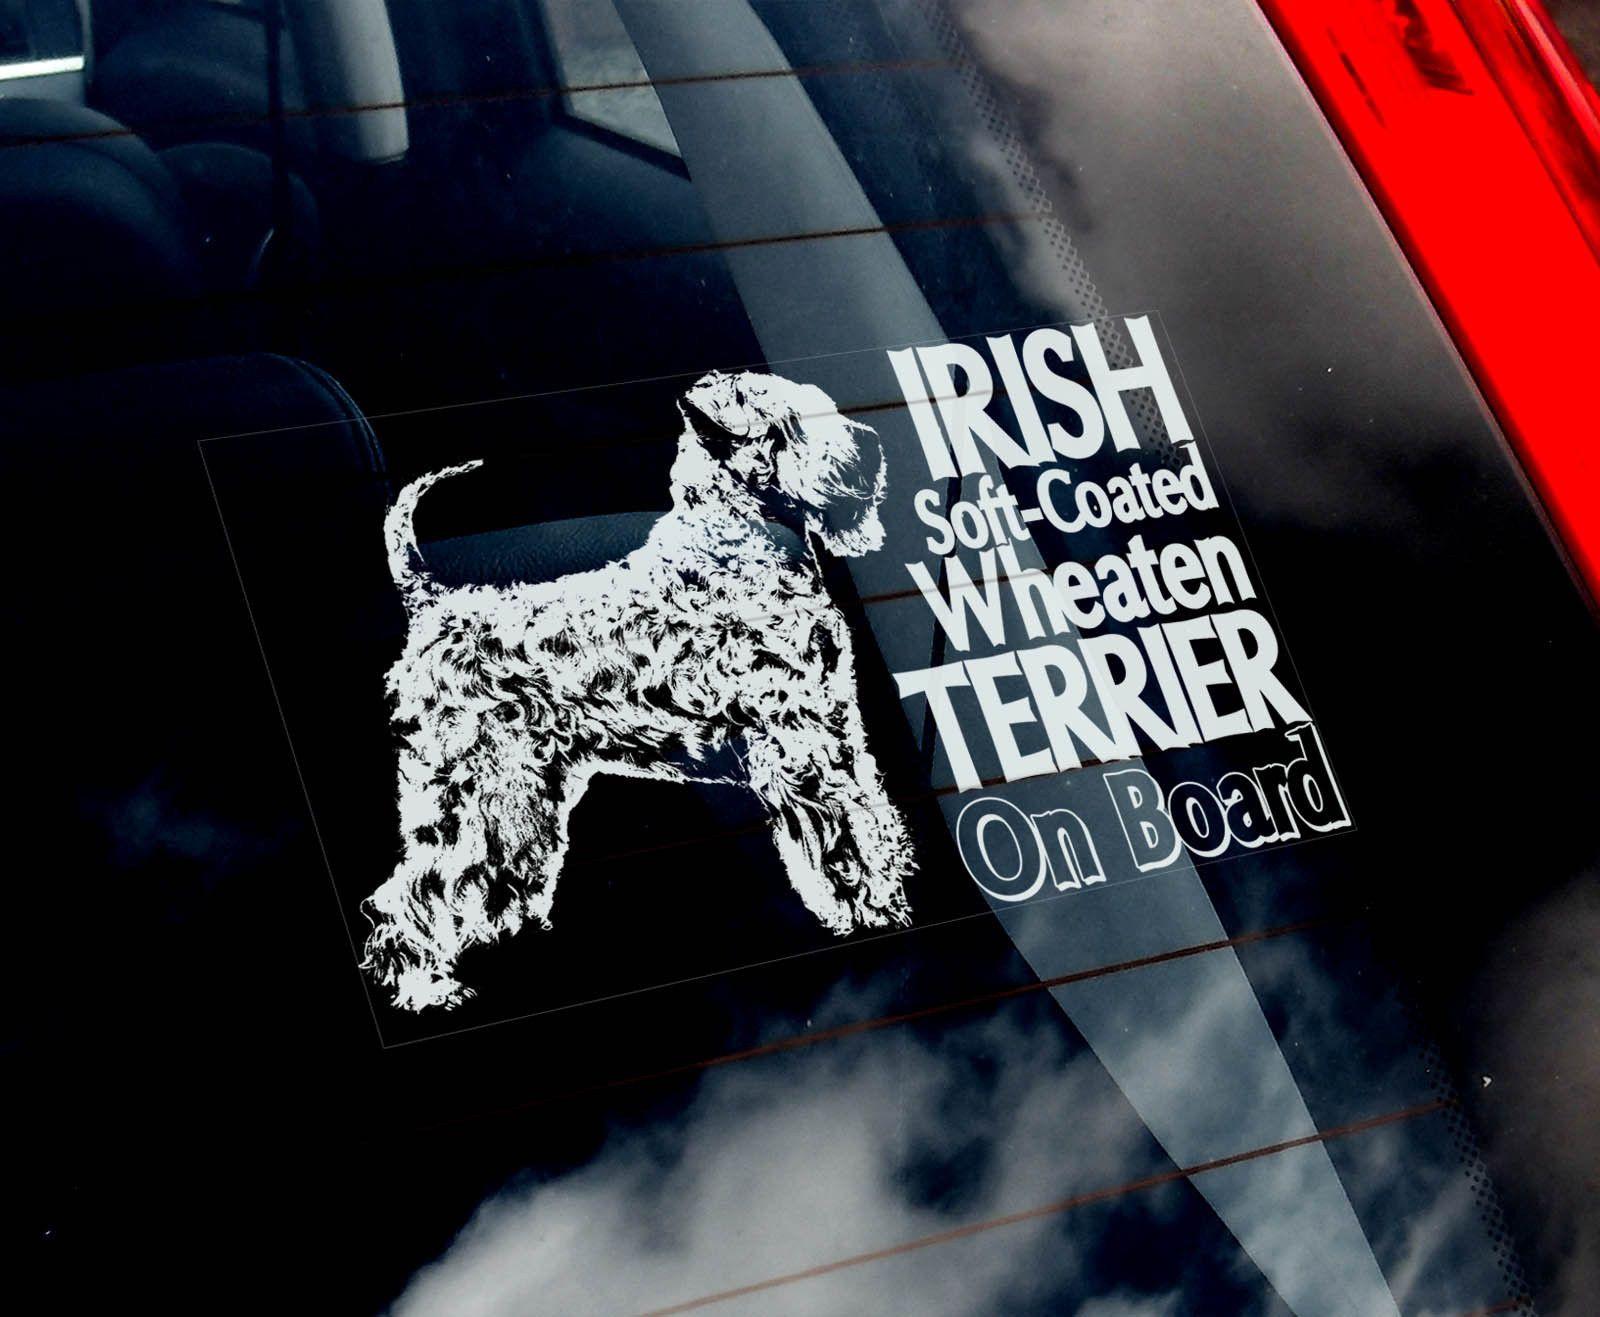 Irish Soft Coated Wheaten Terrier Car Window Sticker Dog Sign N Collar Ebay [ 1317 x 1600 Pixel ]